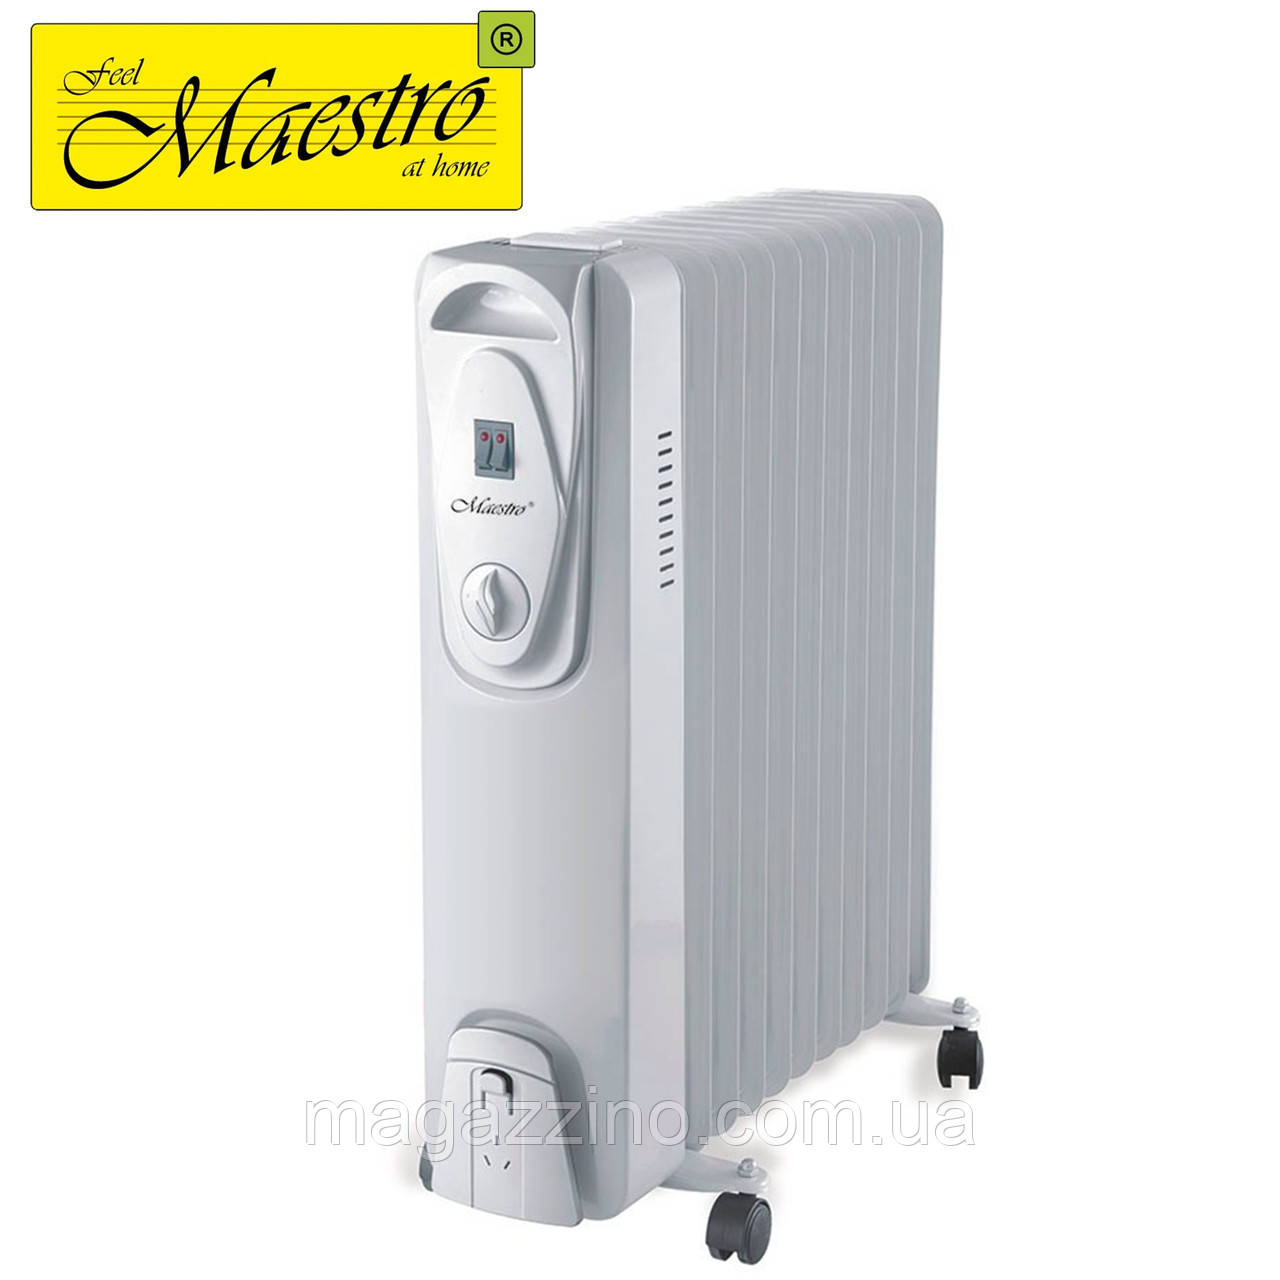 Масляний радіатор Maestro MR-951-11, 2500 Вт.